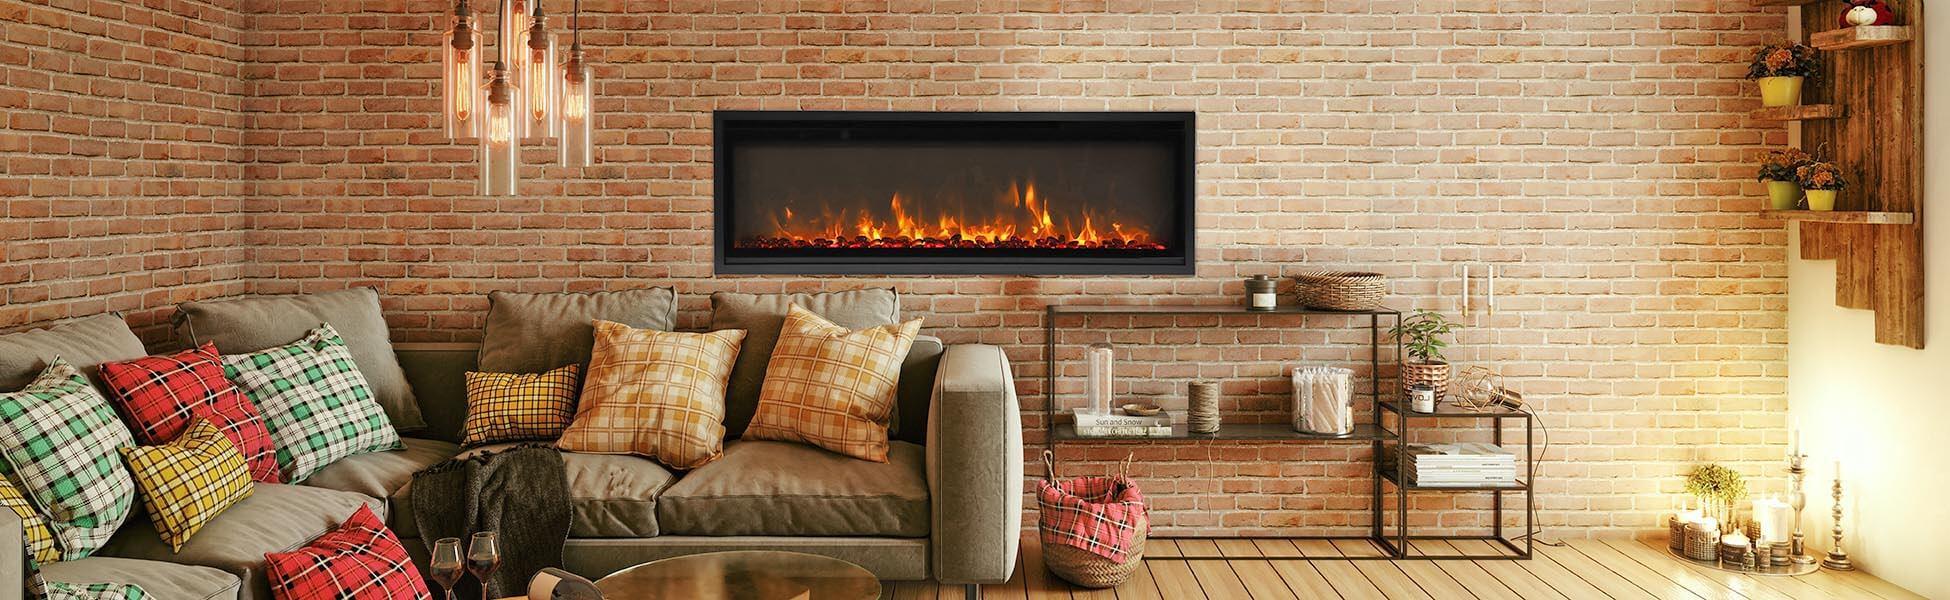 SYM-XS-60 elelctric fireplace